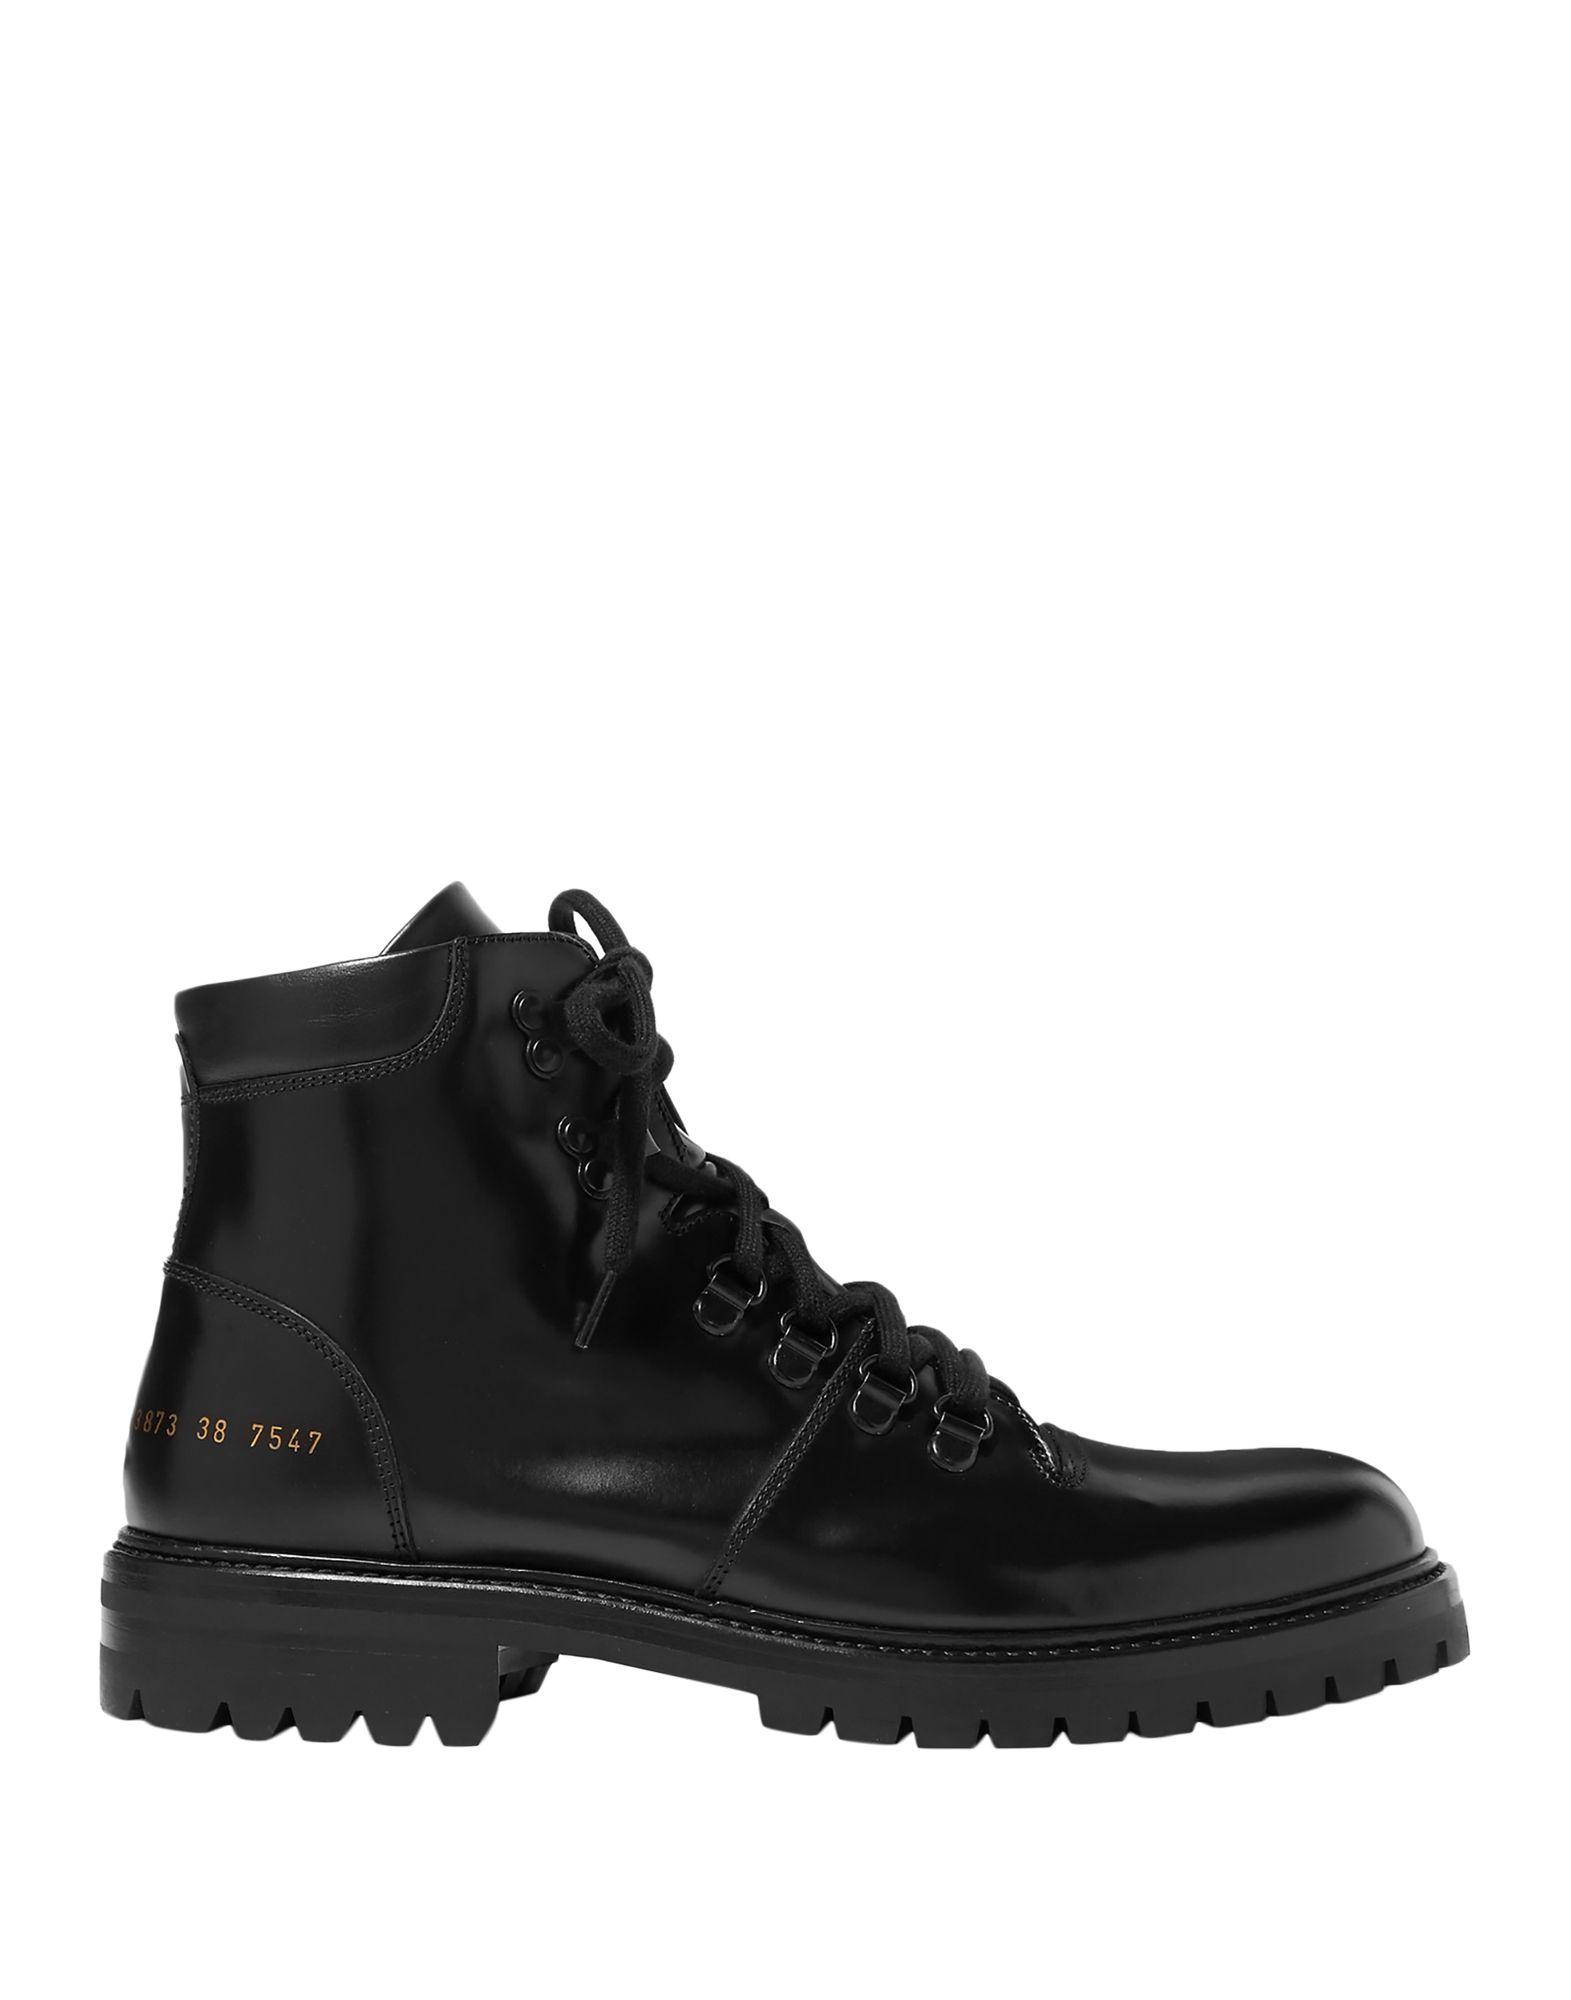 купить WOMAN by COMMON PROJECTS Полусапоги и высокие ботинки дешево